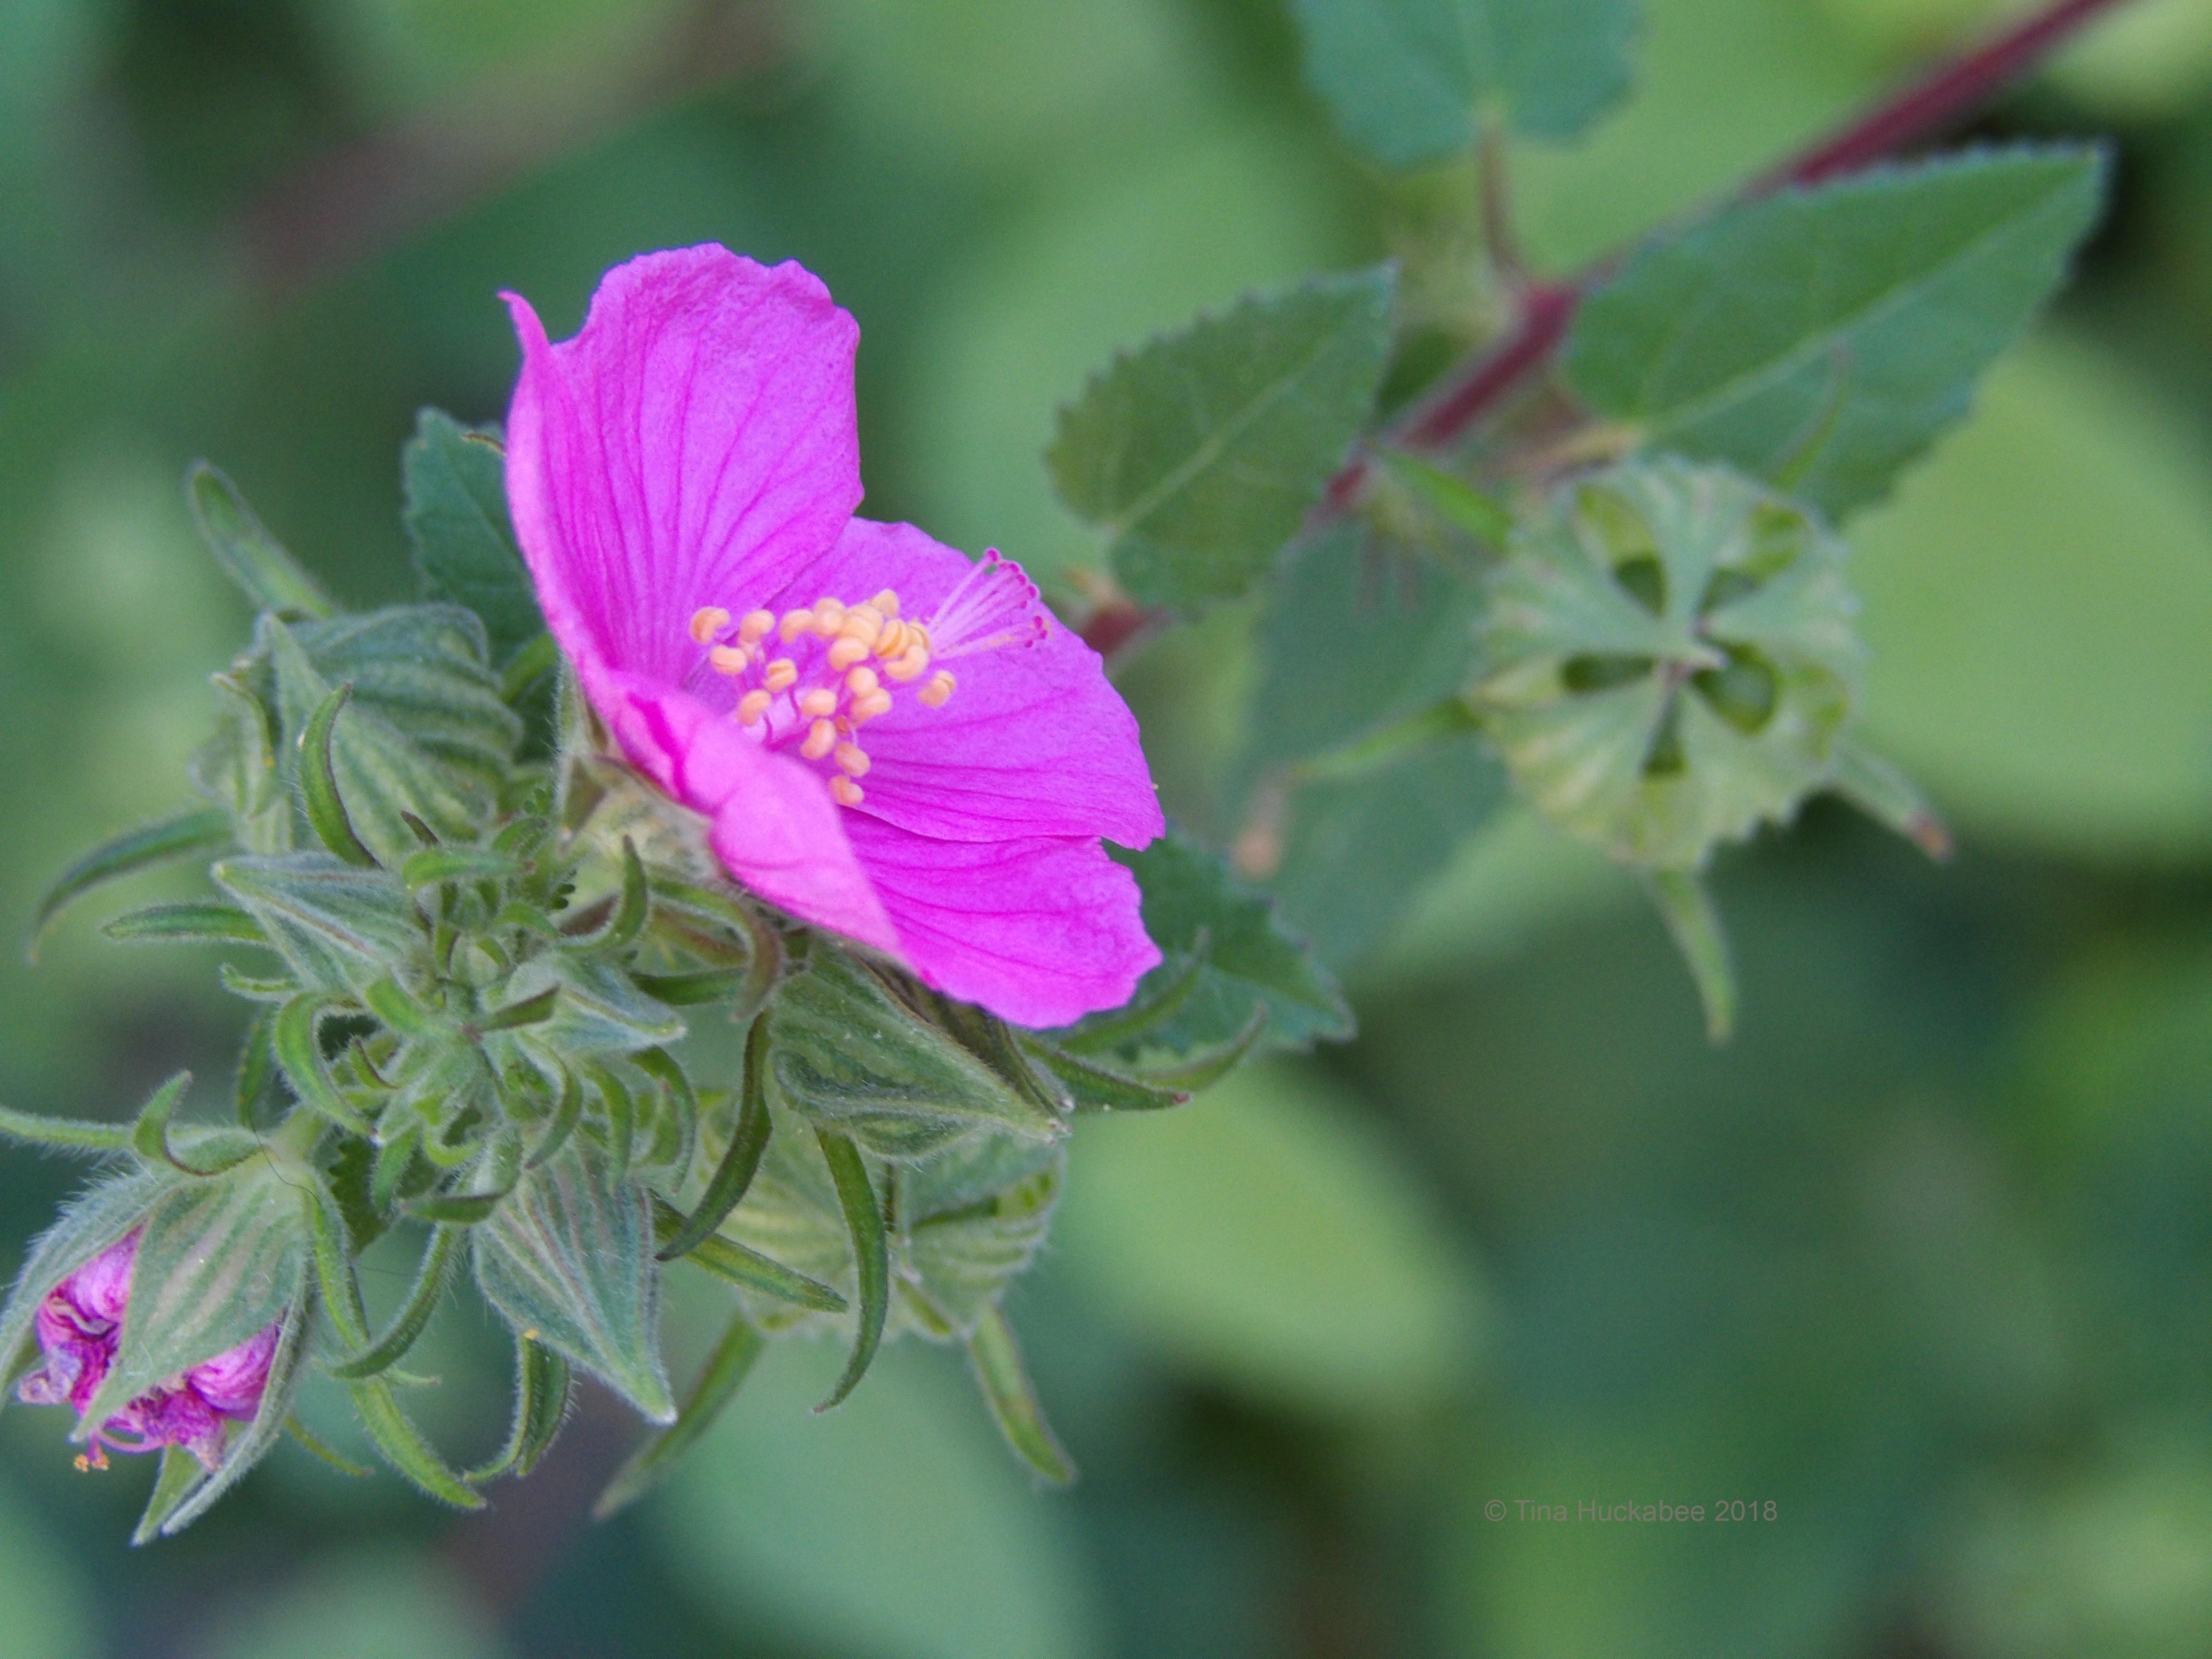 Rock Rose Pavonia Lasiopetala A Seasonal Look My Gardener Says